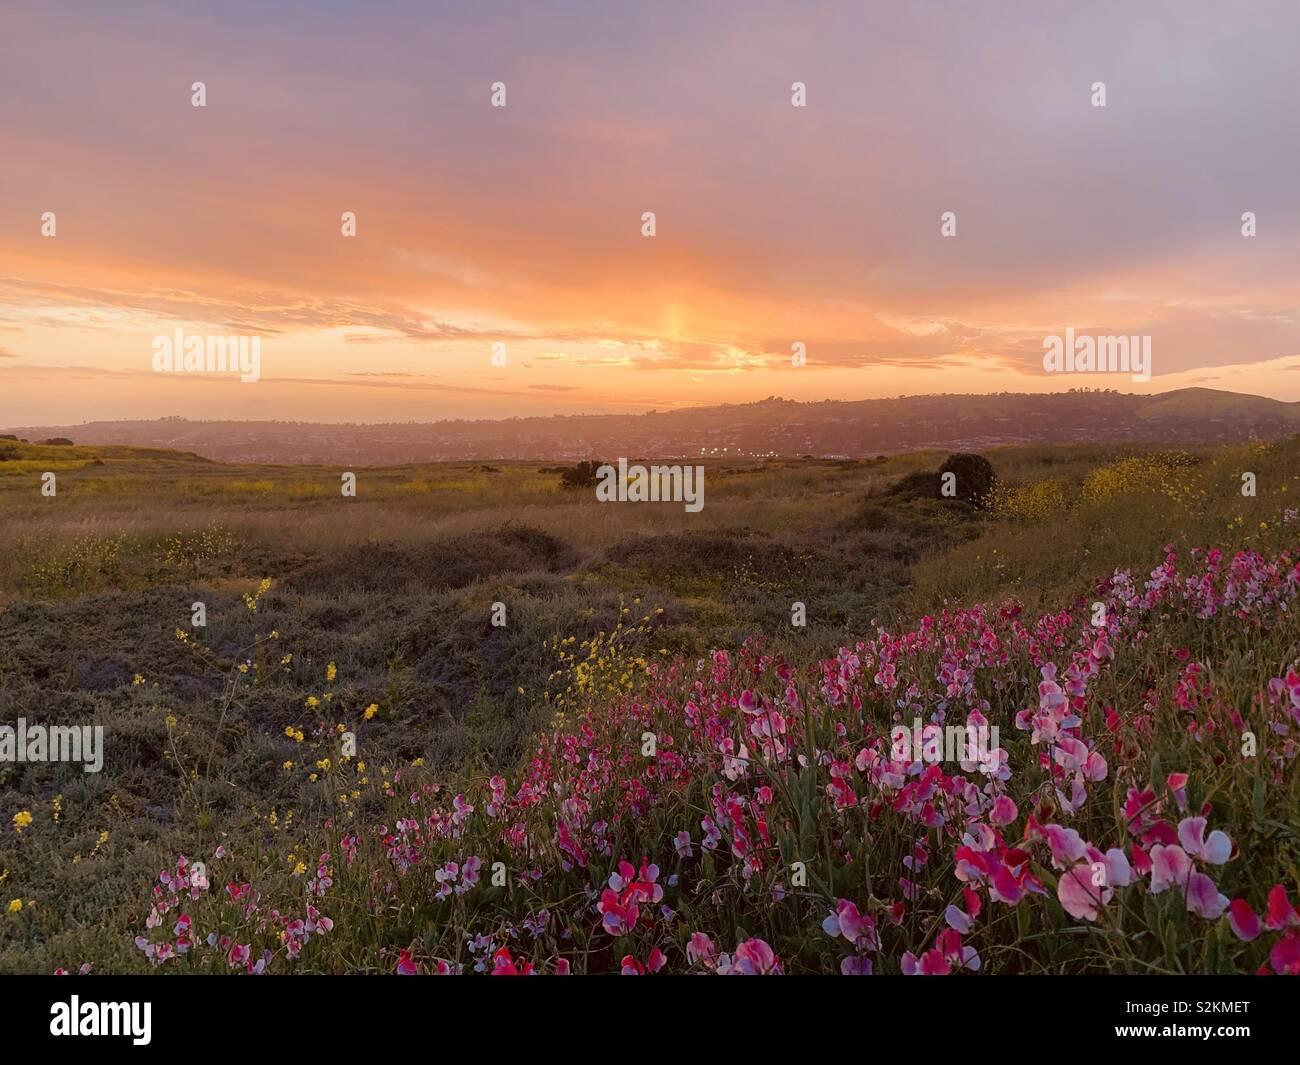 Ein farbenfroher Sonnenuntergang Himmel über einem blühenden Wildblumen Feld in San Juan Capistrano in Südkalifornien: Stockbild